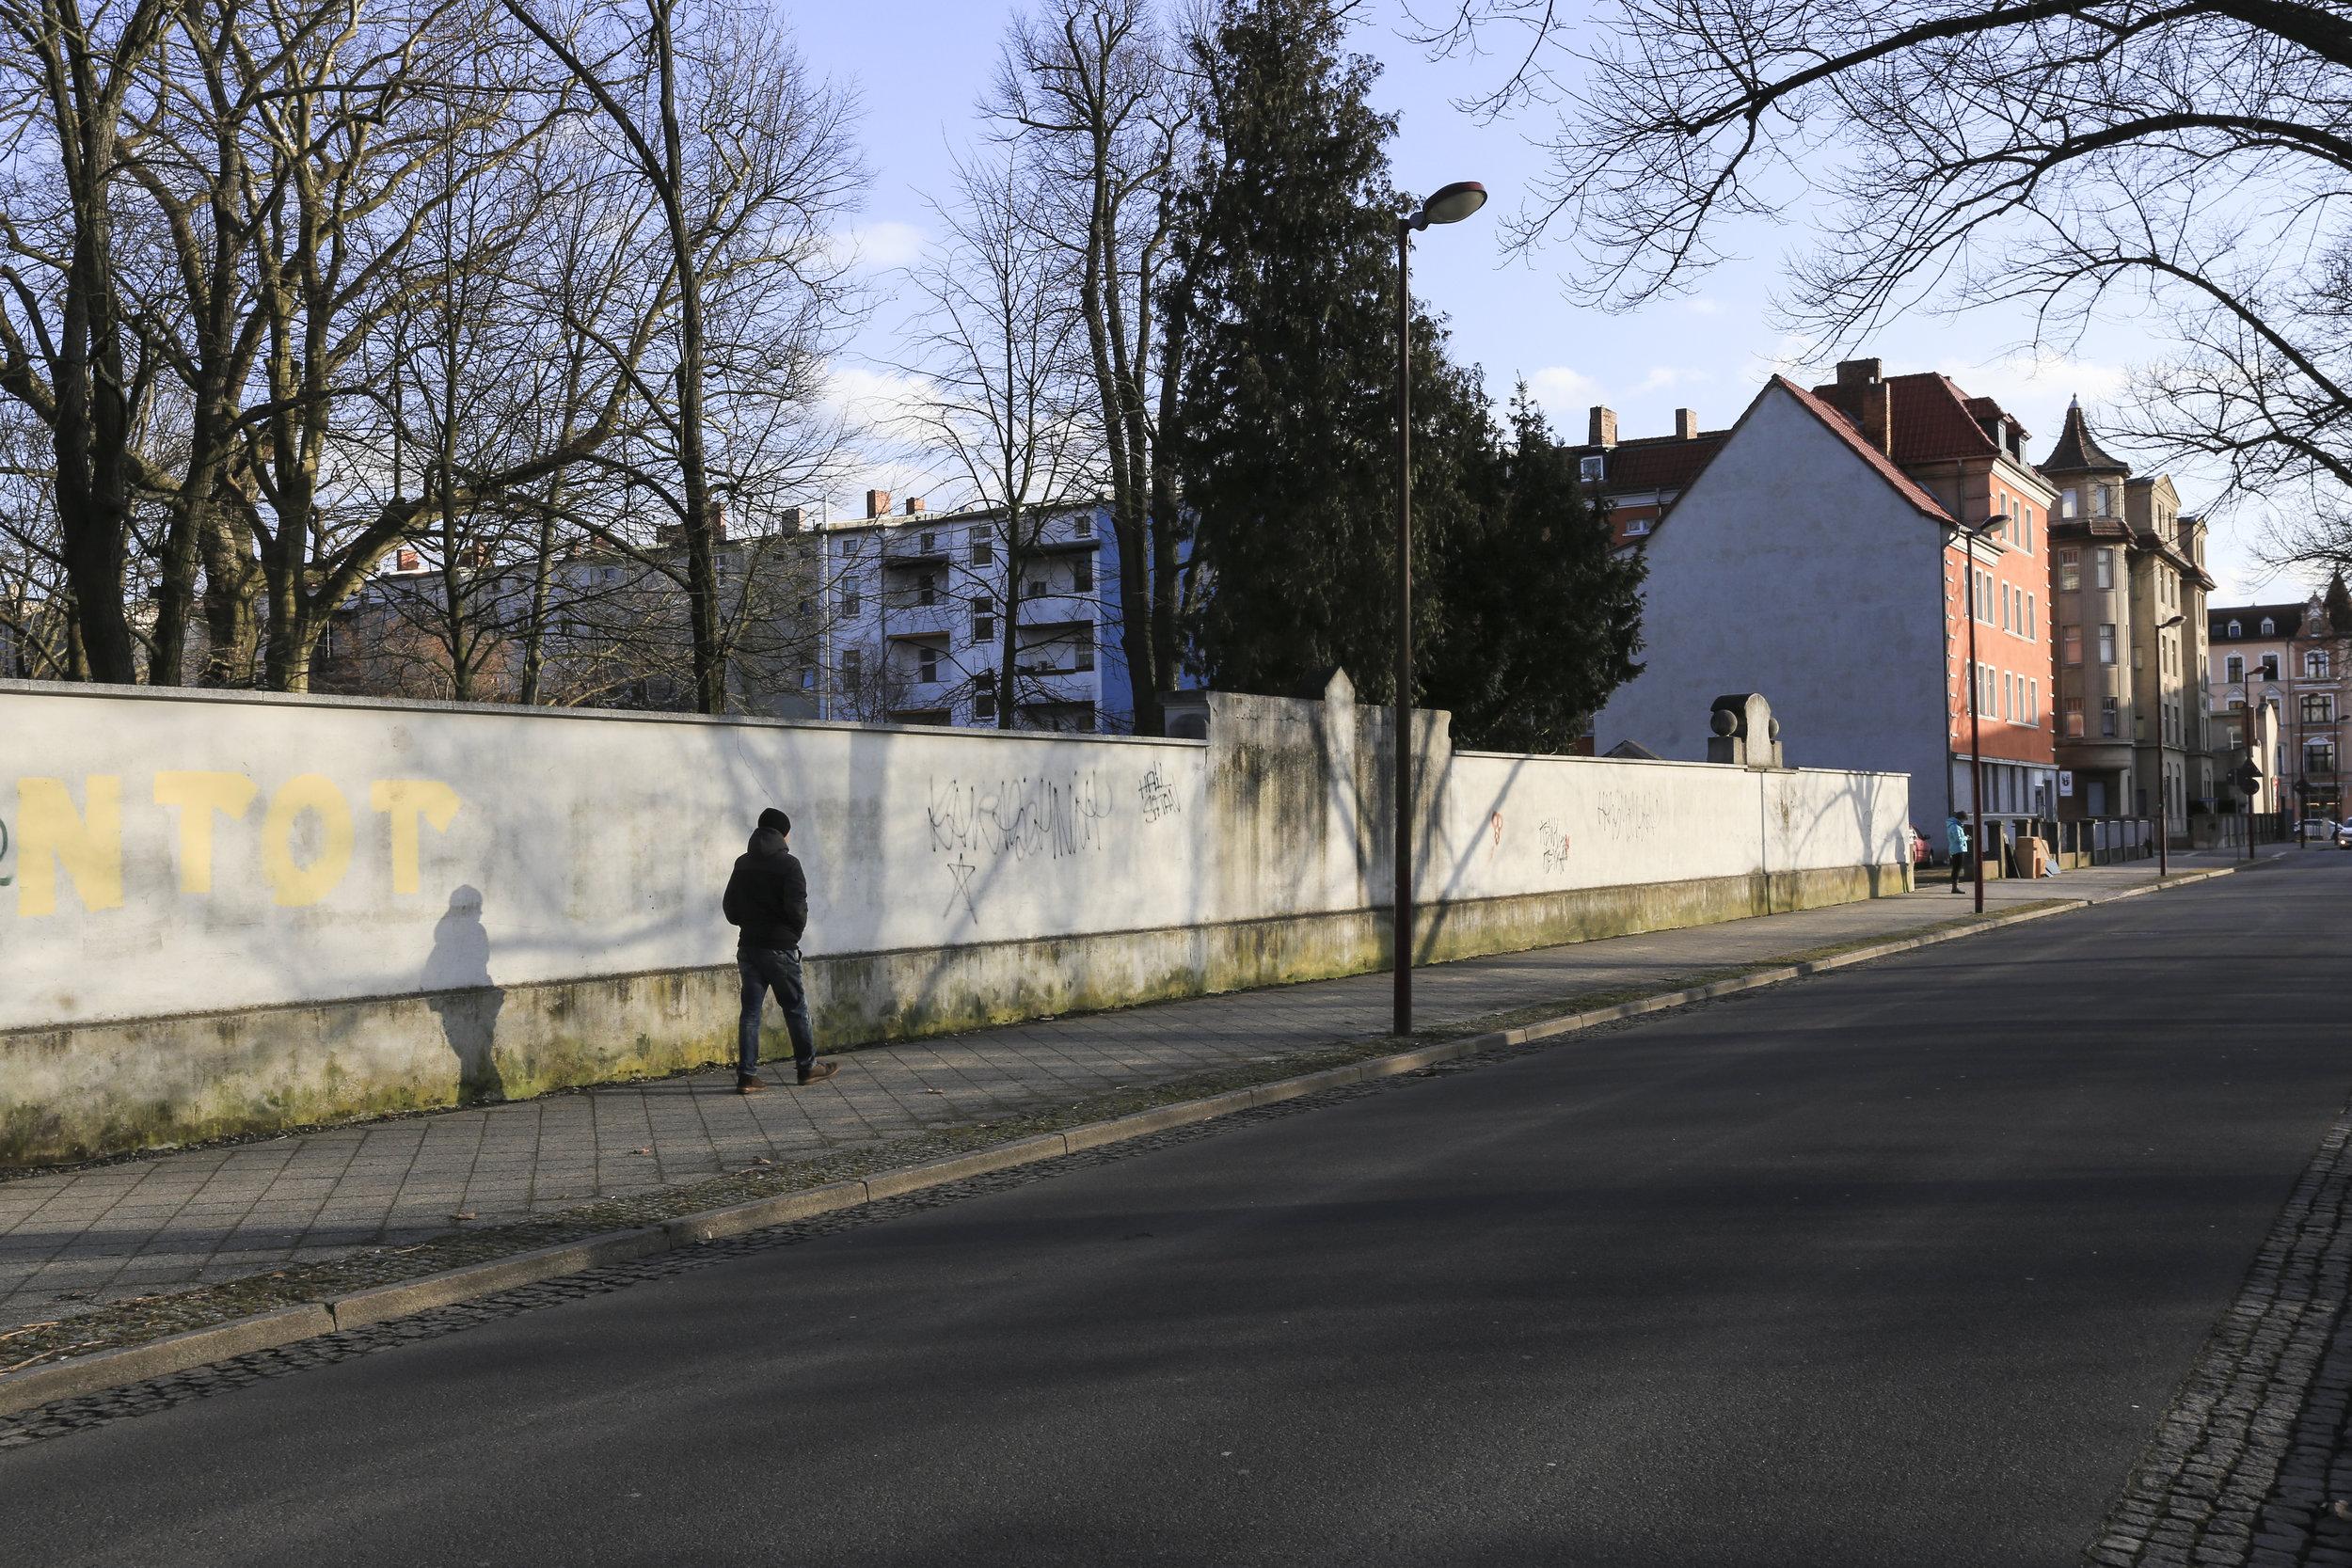 Forst_Lausitz_Mauer_Fassade_Graffiti_Vandalismus